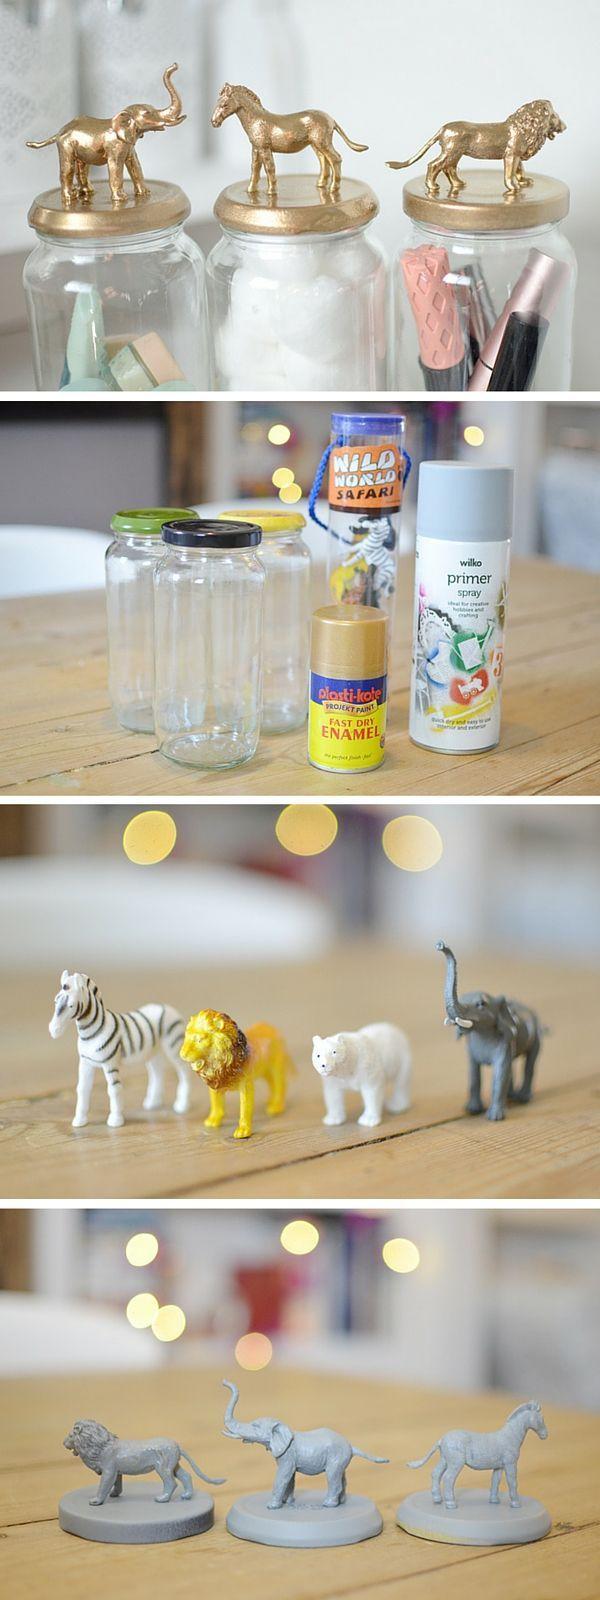 25 Best Ideas About DIY Home Decor On Pinterest Home Design Diy